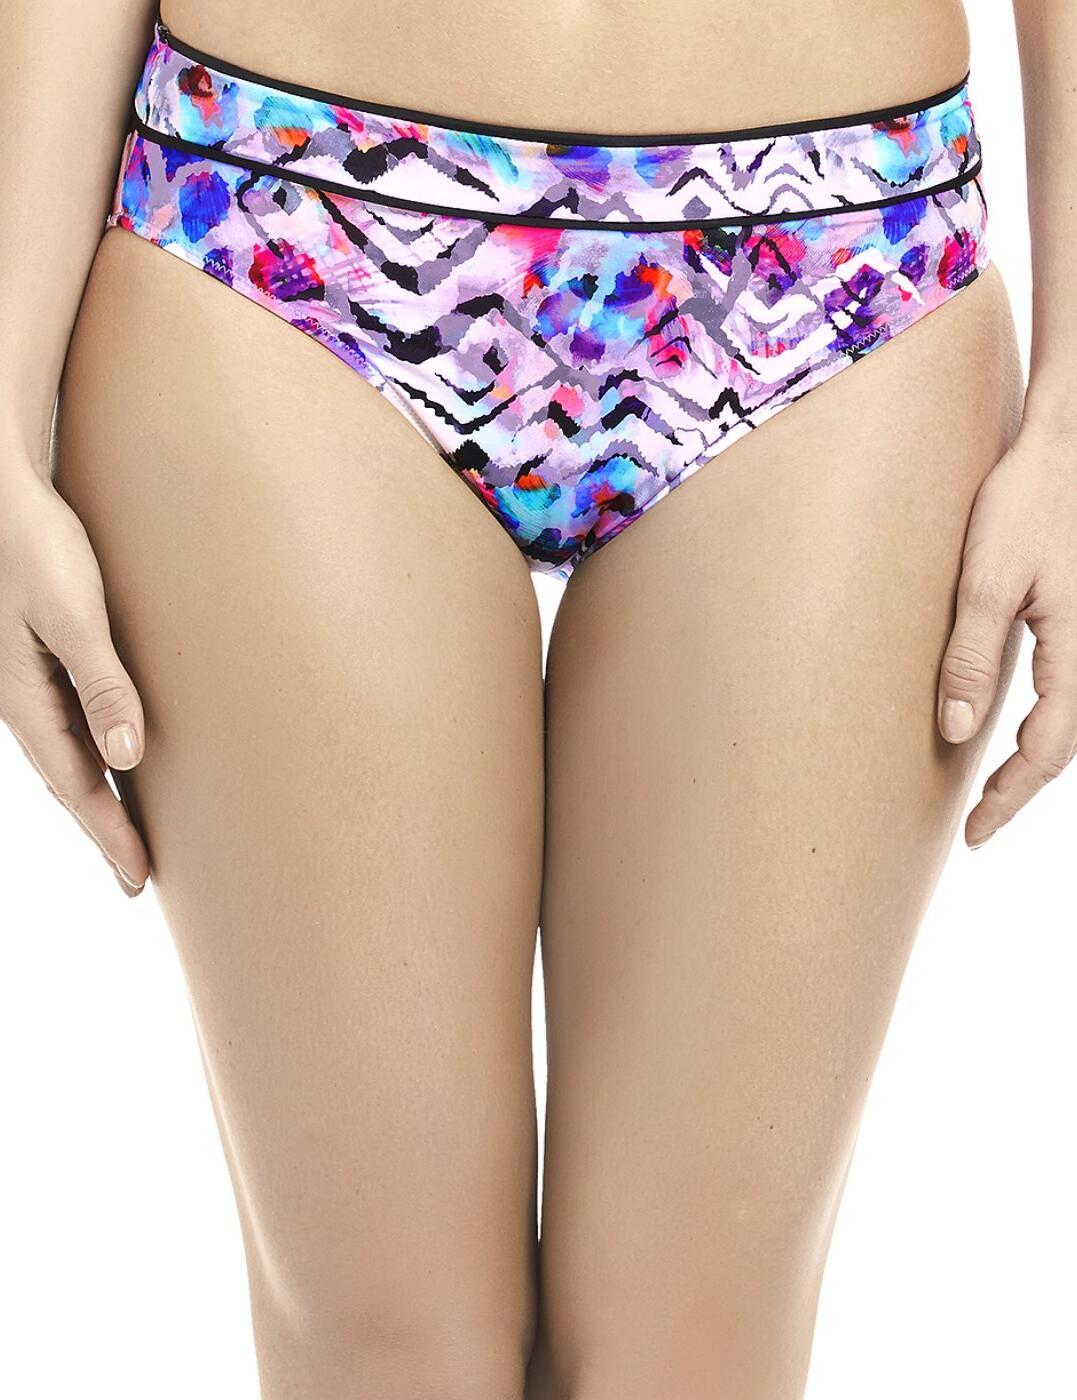 6449 Fantasie Malundi Mid Rise Bikini Brief - 6449 Multi